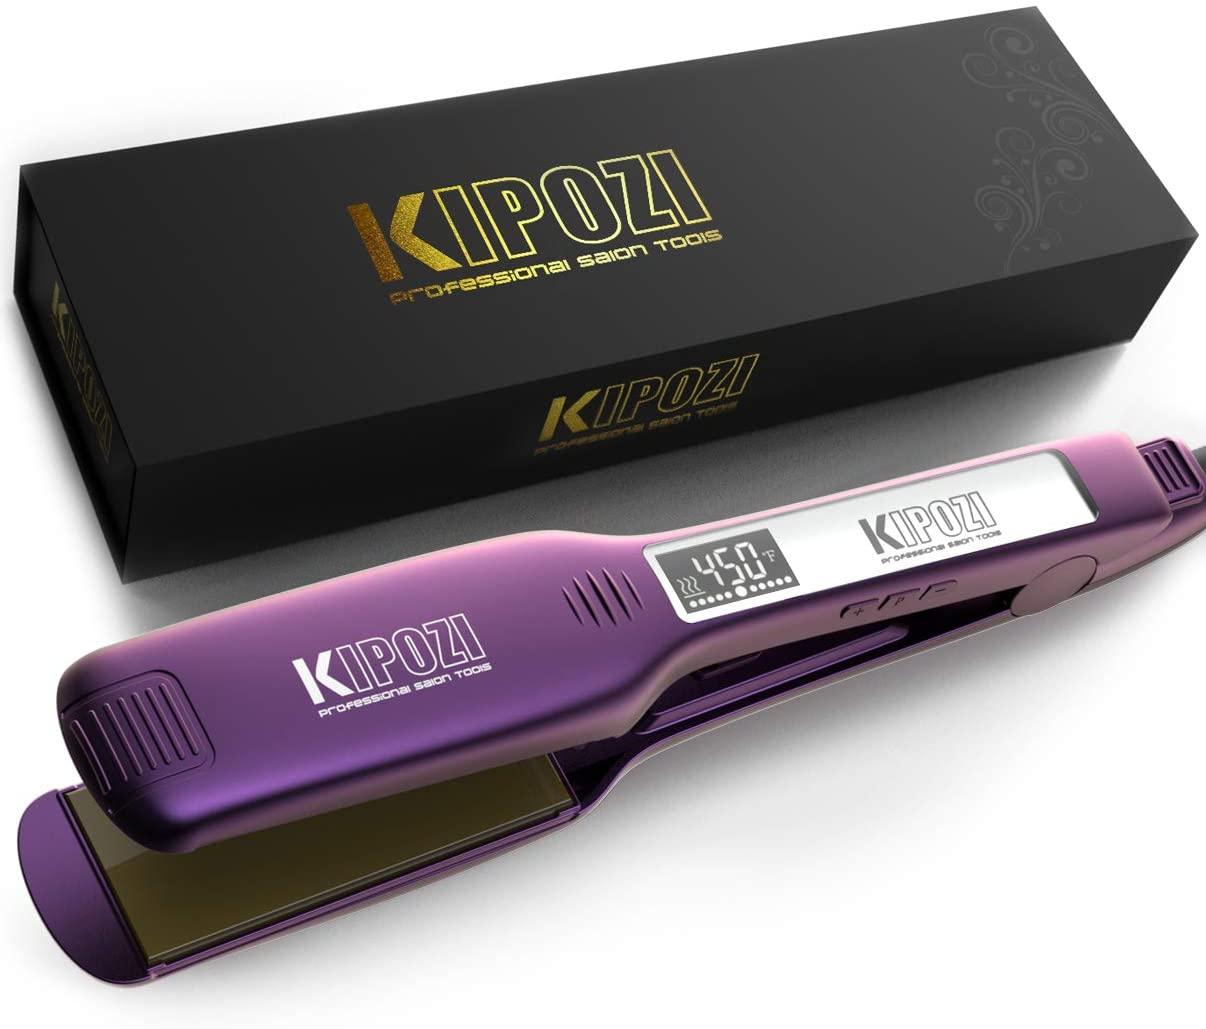 KIPOZI K-139 Professional Hair Straightener 1.75″ Titanium Flat Iron With Digital Display